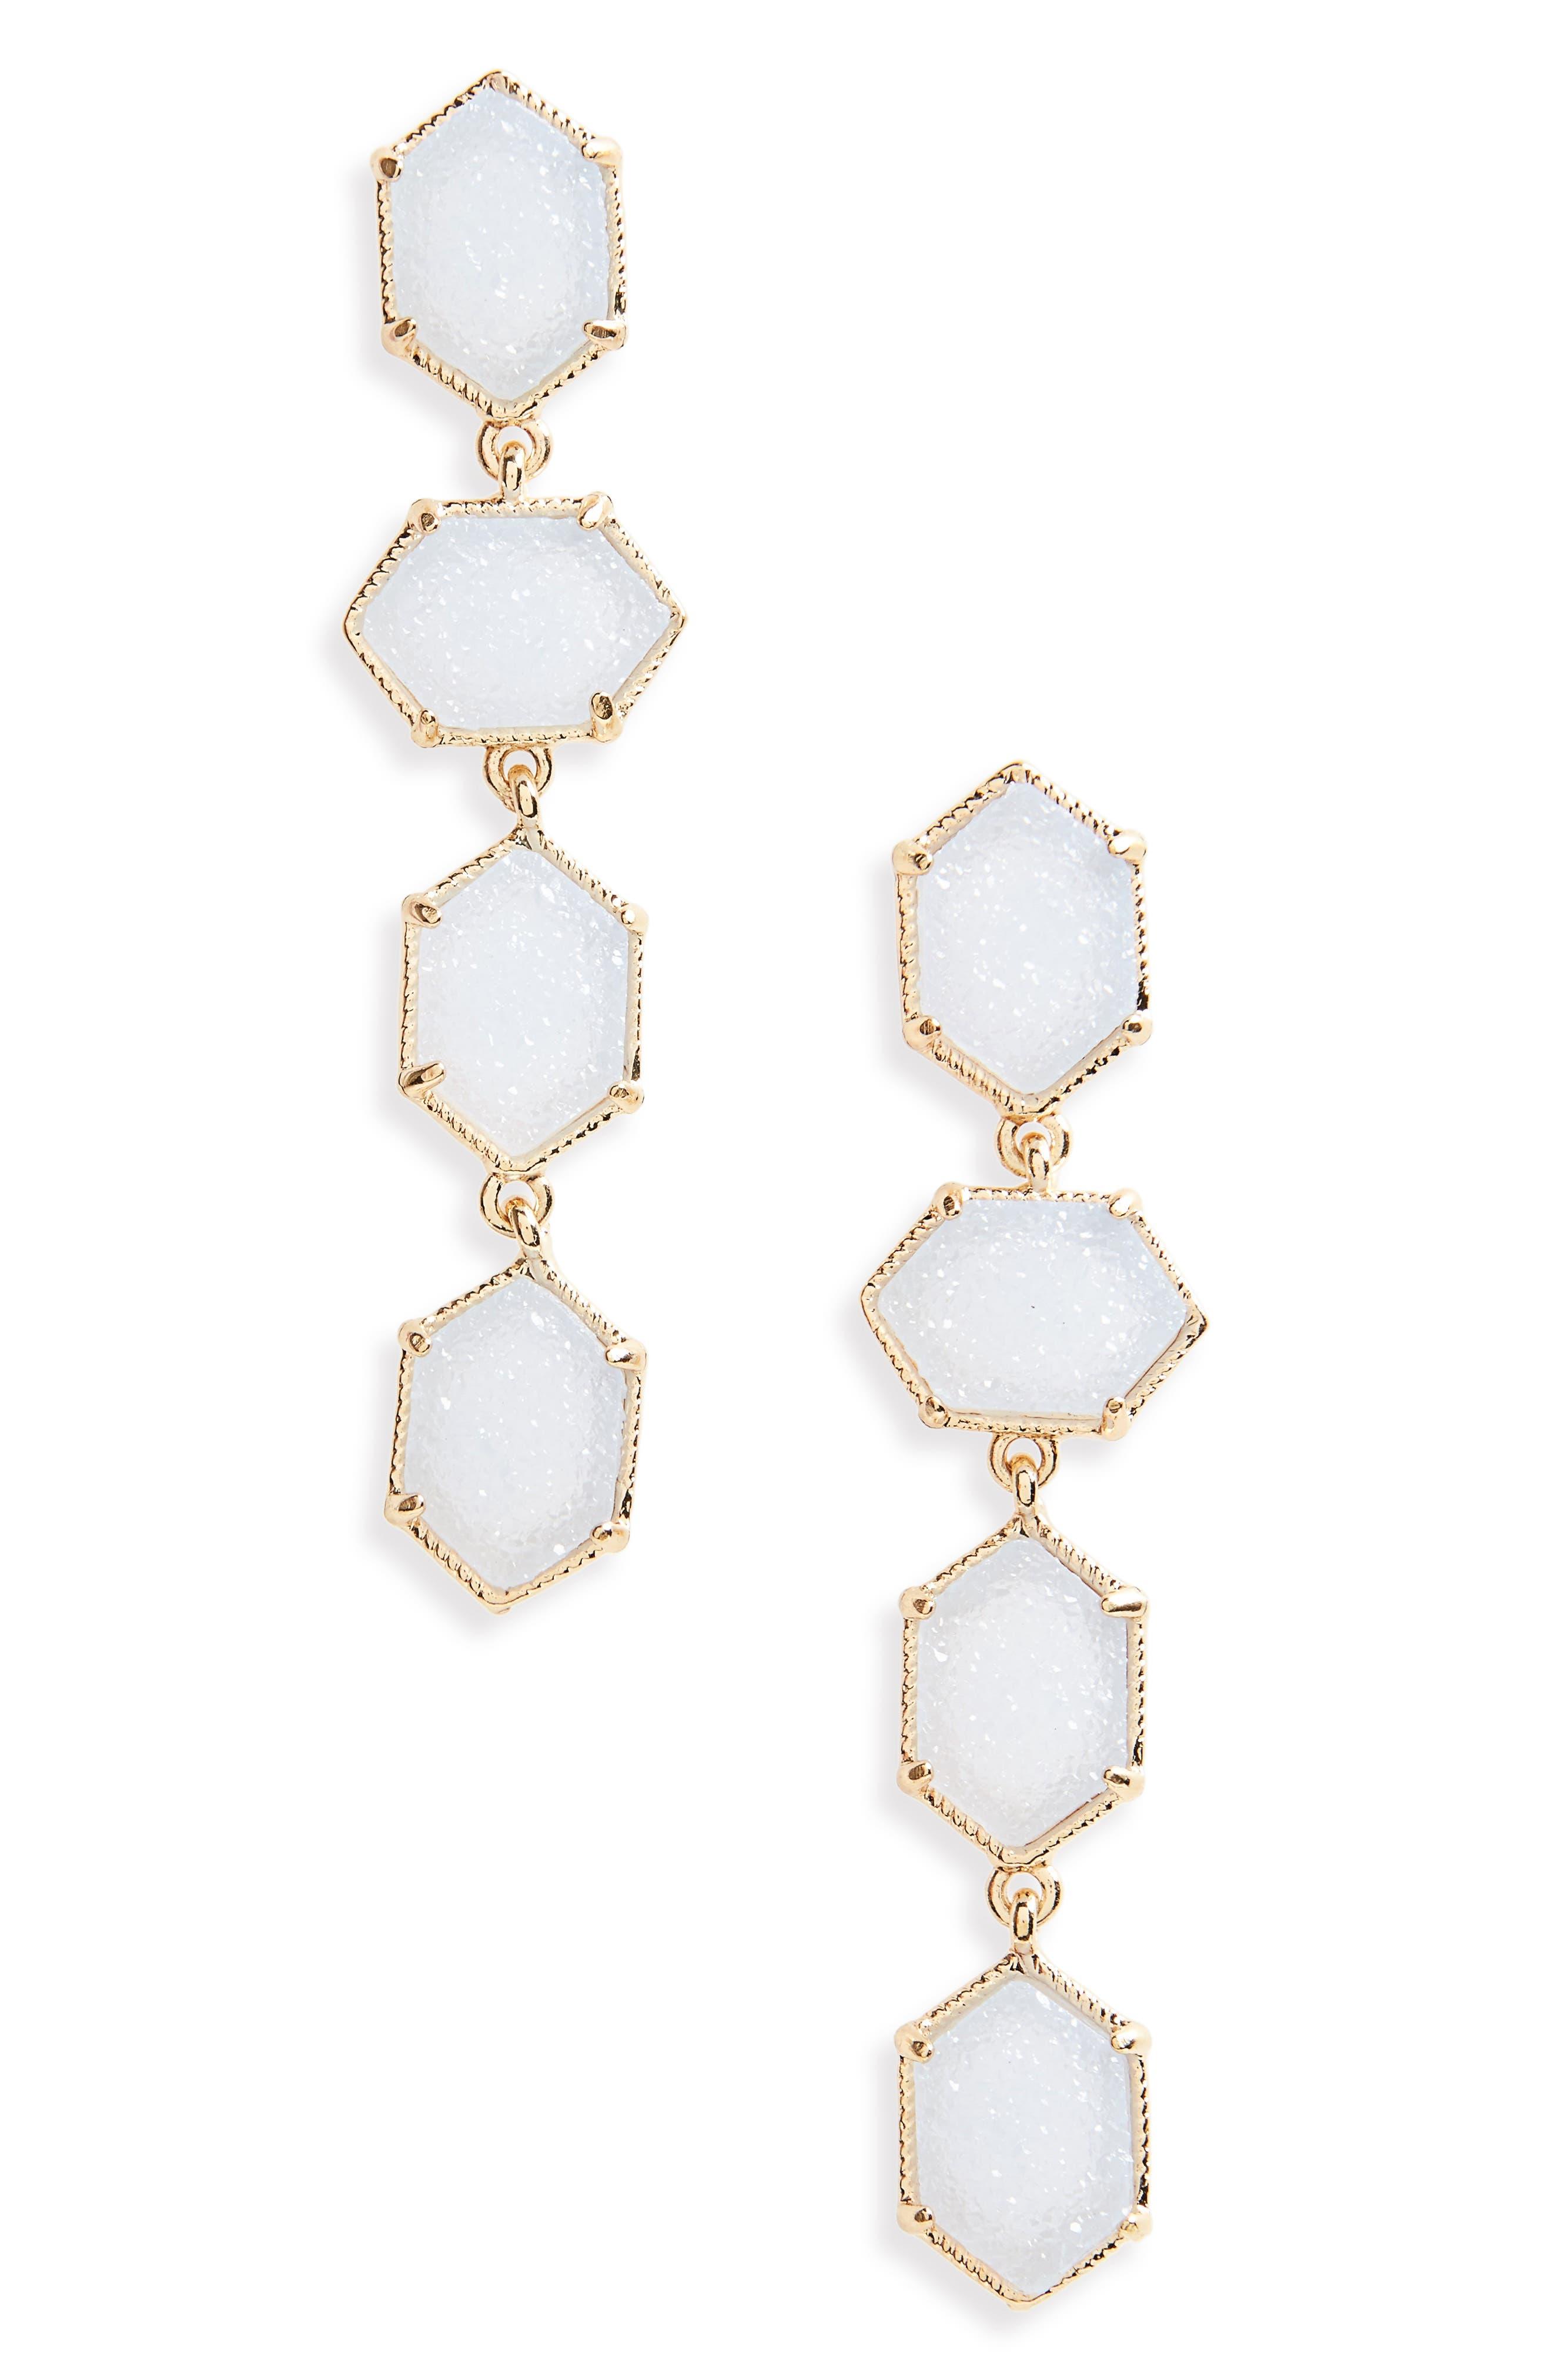 Main Image - Panacea Linear Earrings